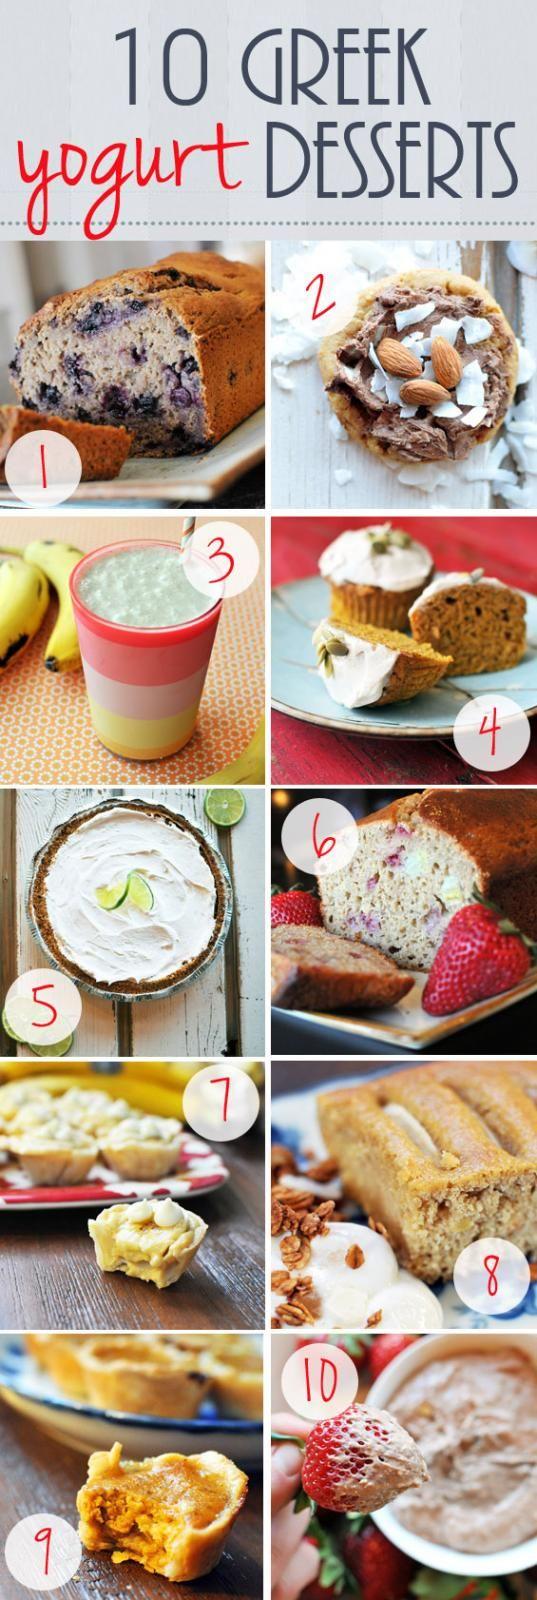 10 Greek Yogurt Dessert Recipes // @Dawn Cameron-Hollyer G and Nourish